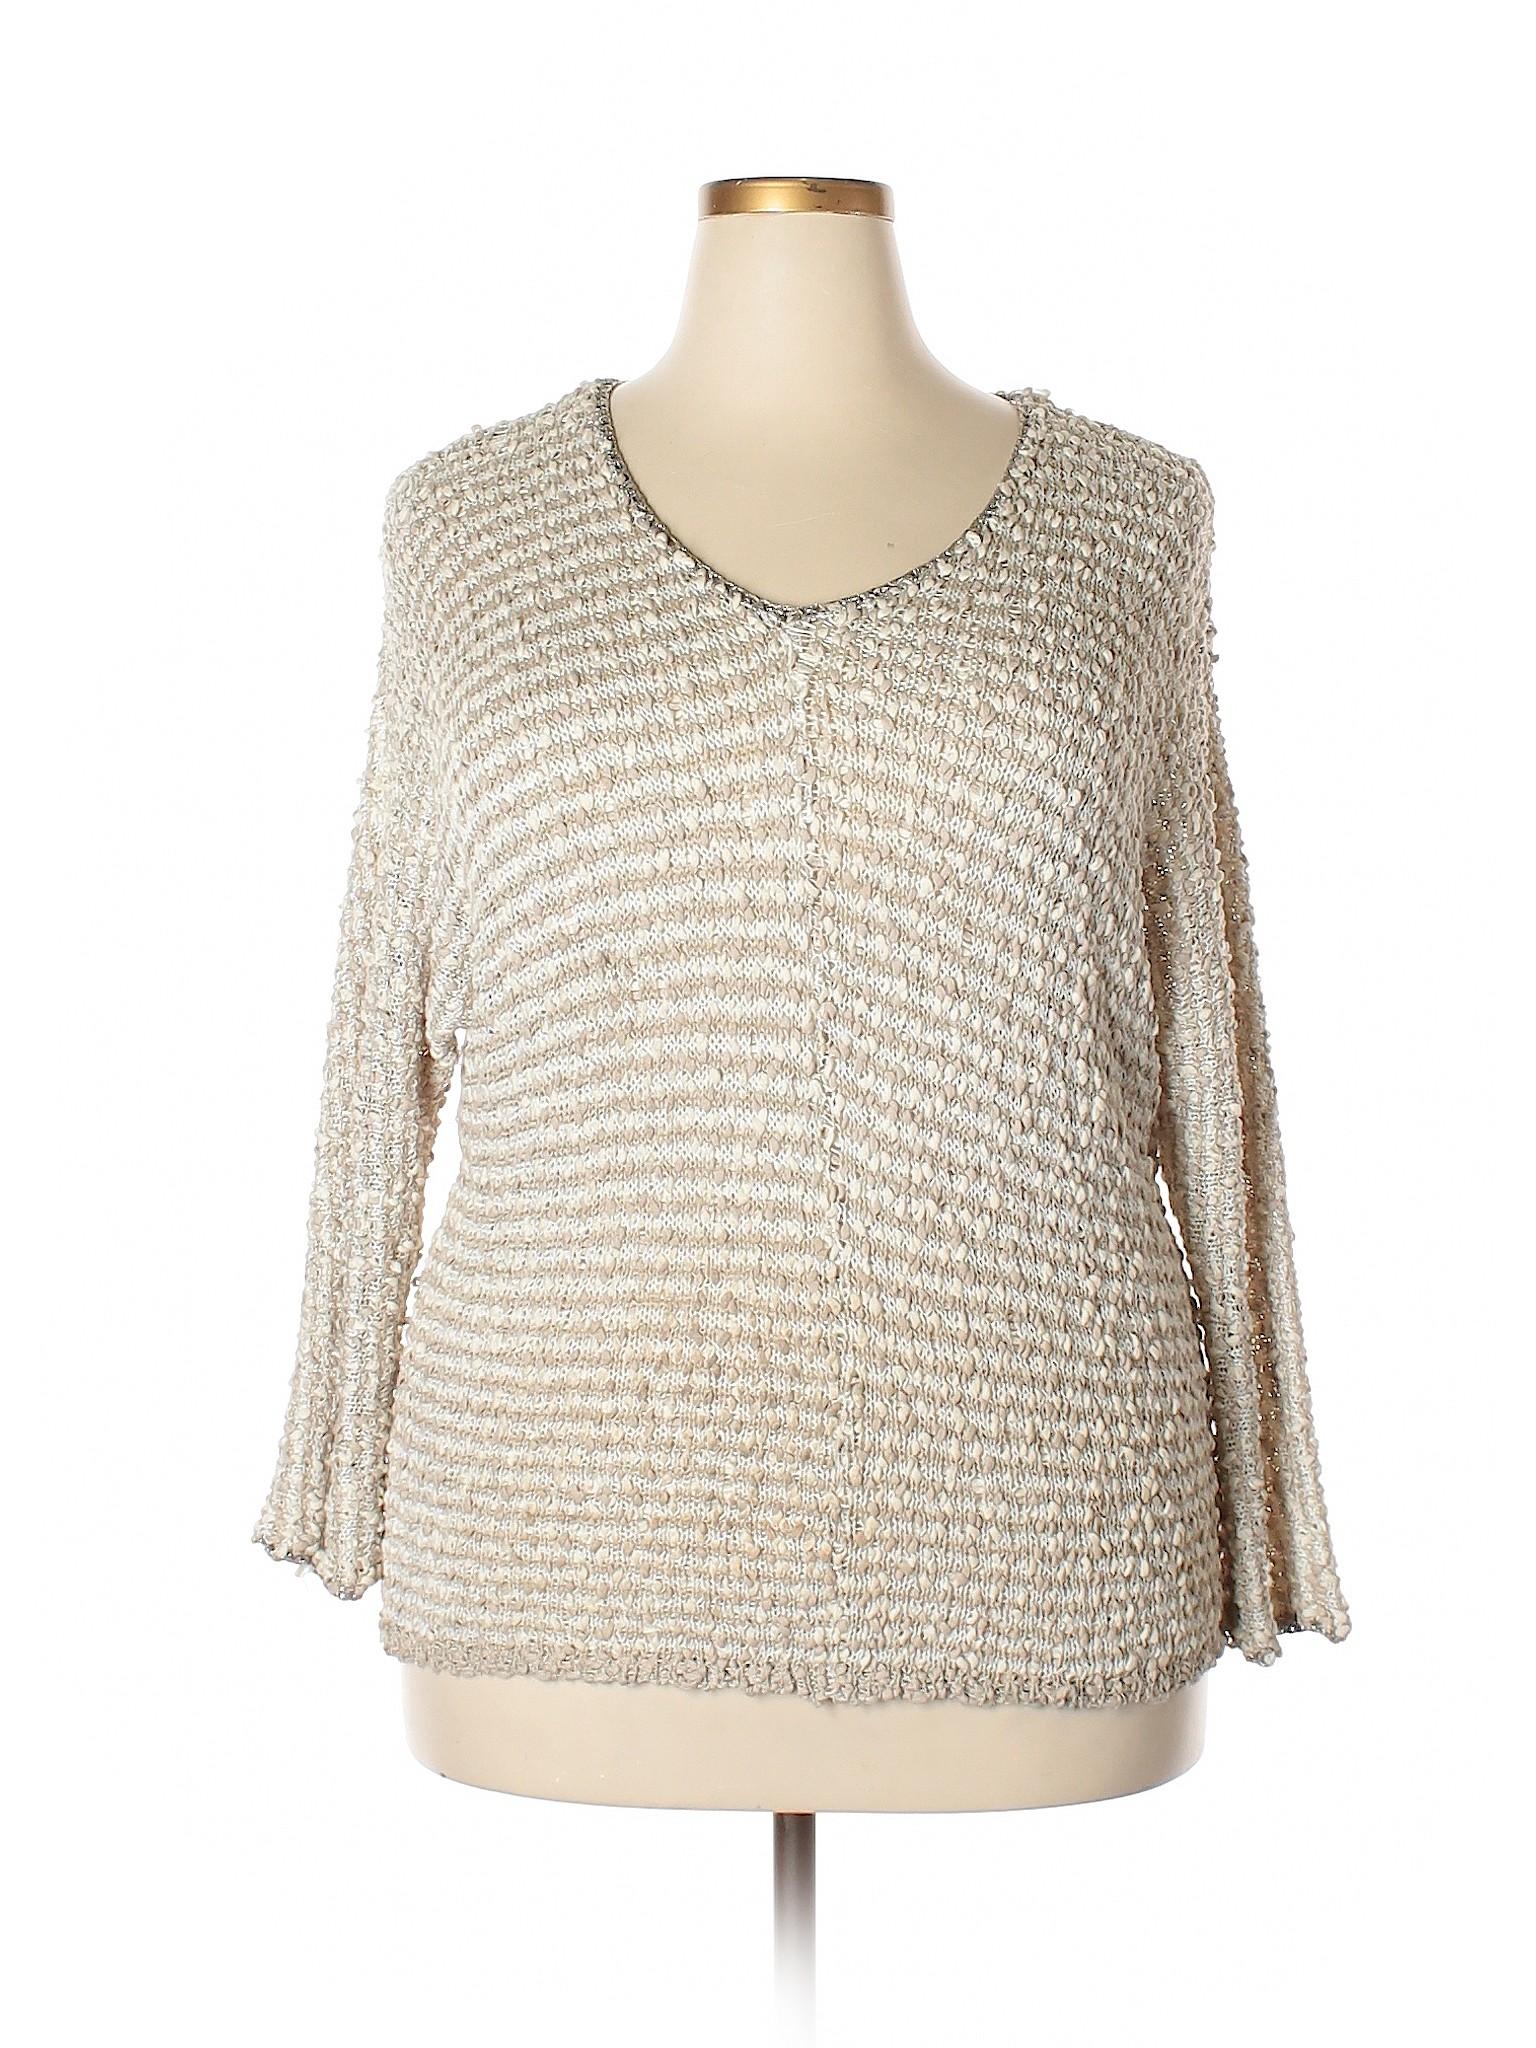 Pullover Concepts Boutique Sweater Winter International Inc 8txw6qqHAI